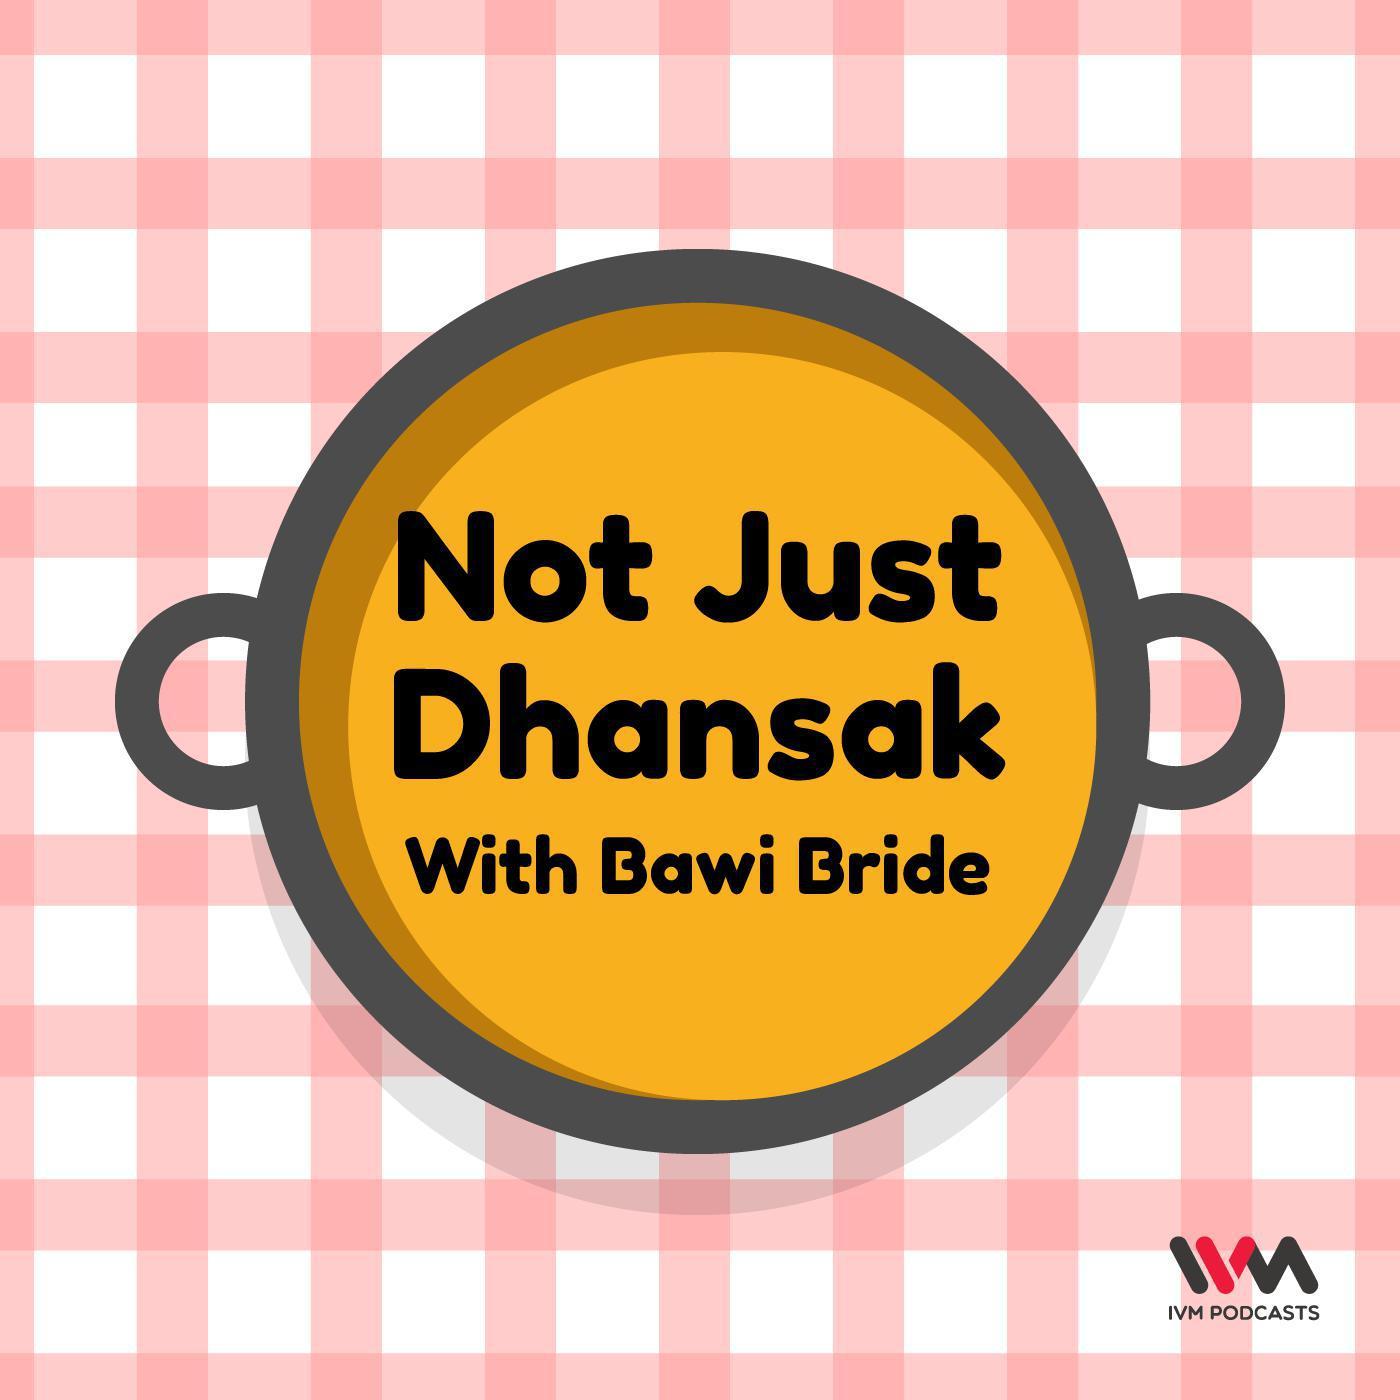 Not Just Dhansak |